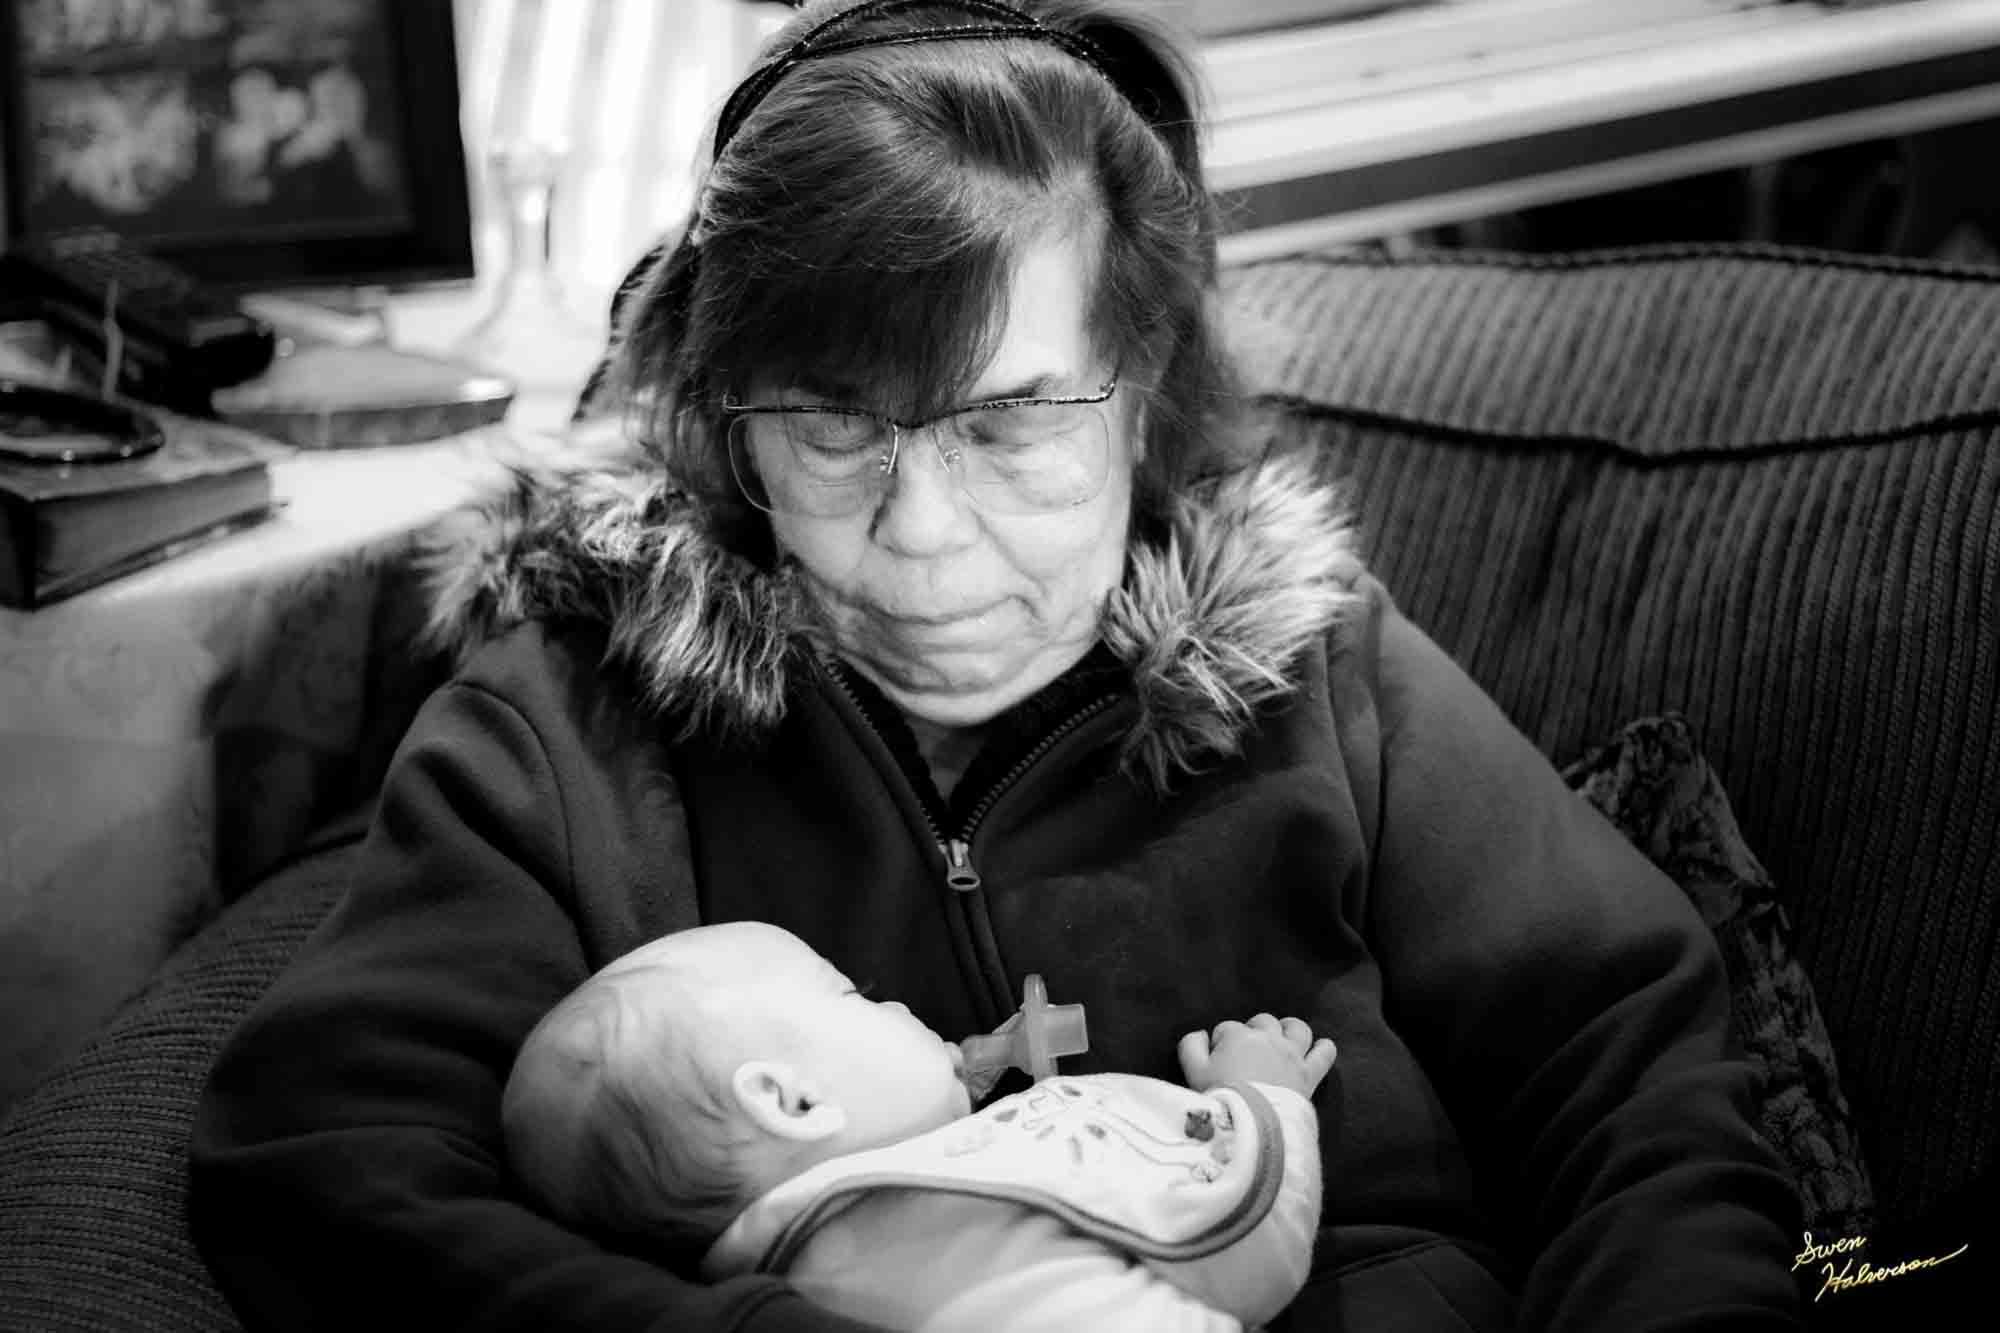 Theme: Cuddly | Title: Ezri & Her Great Grandma